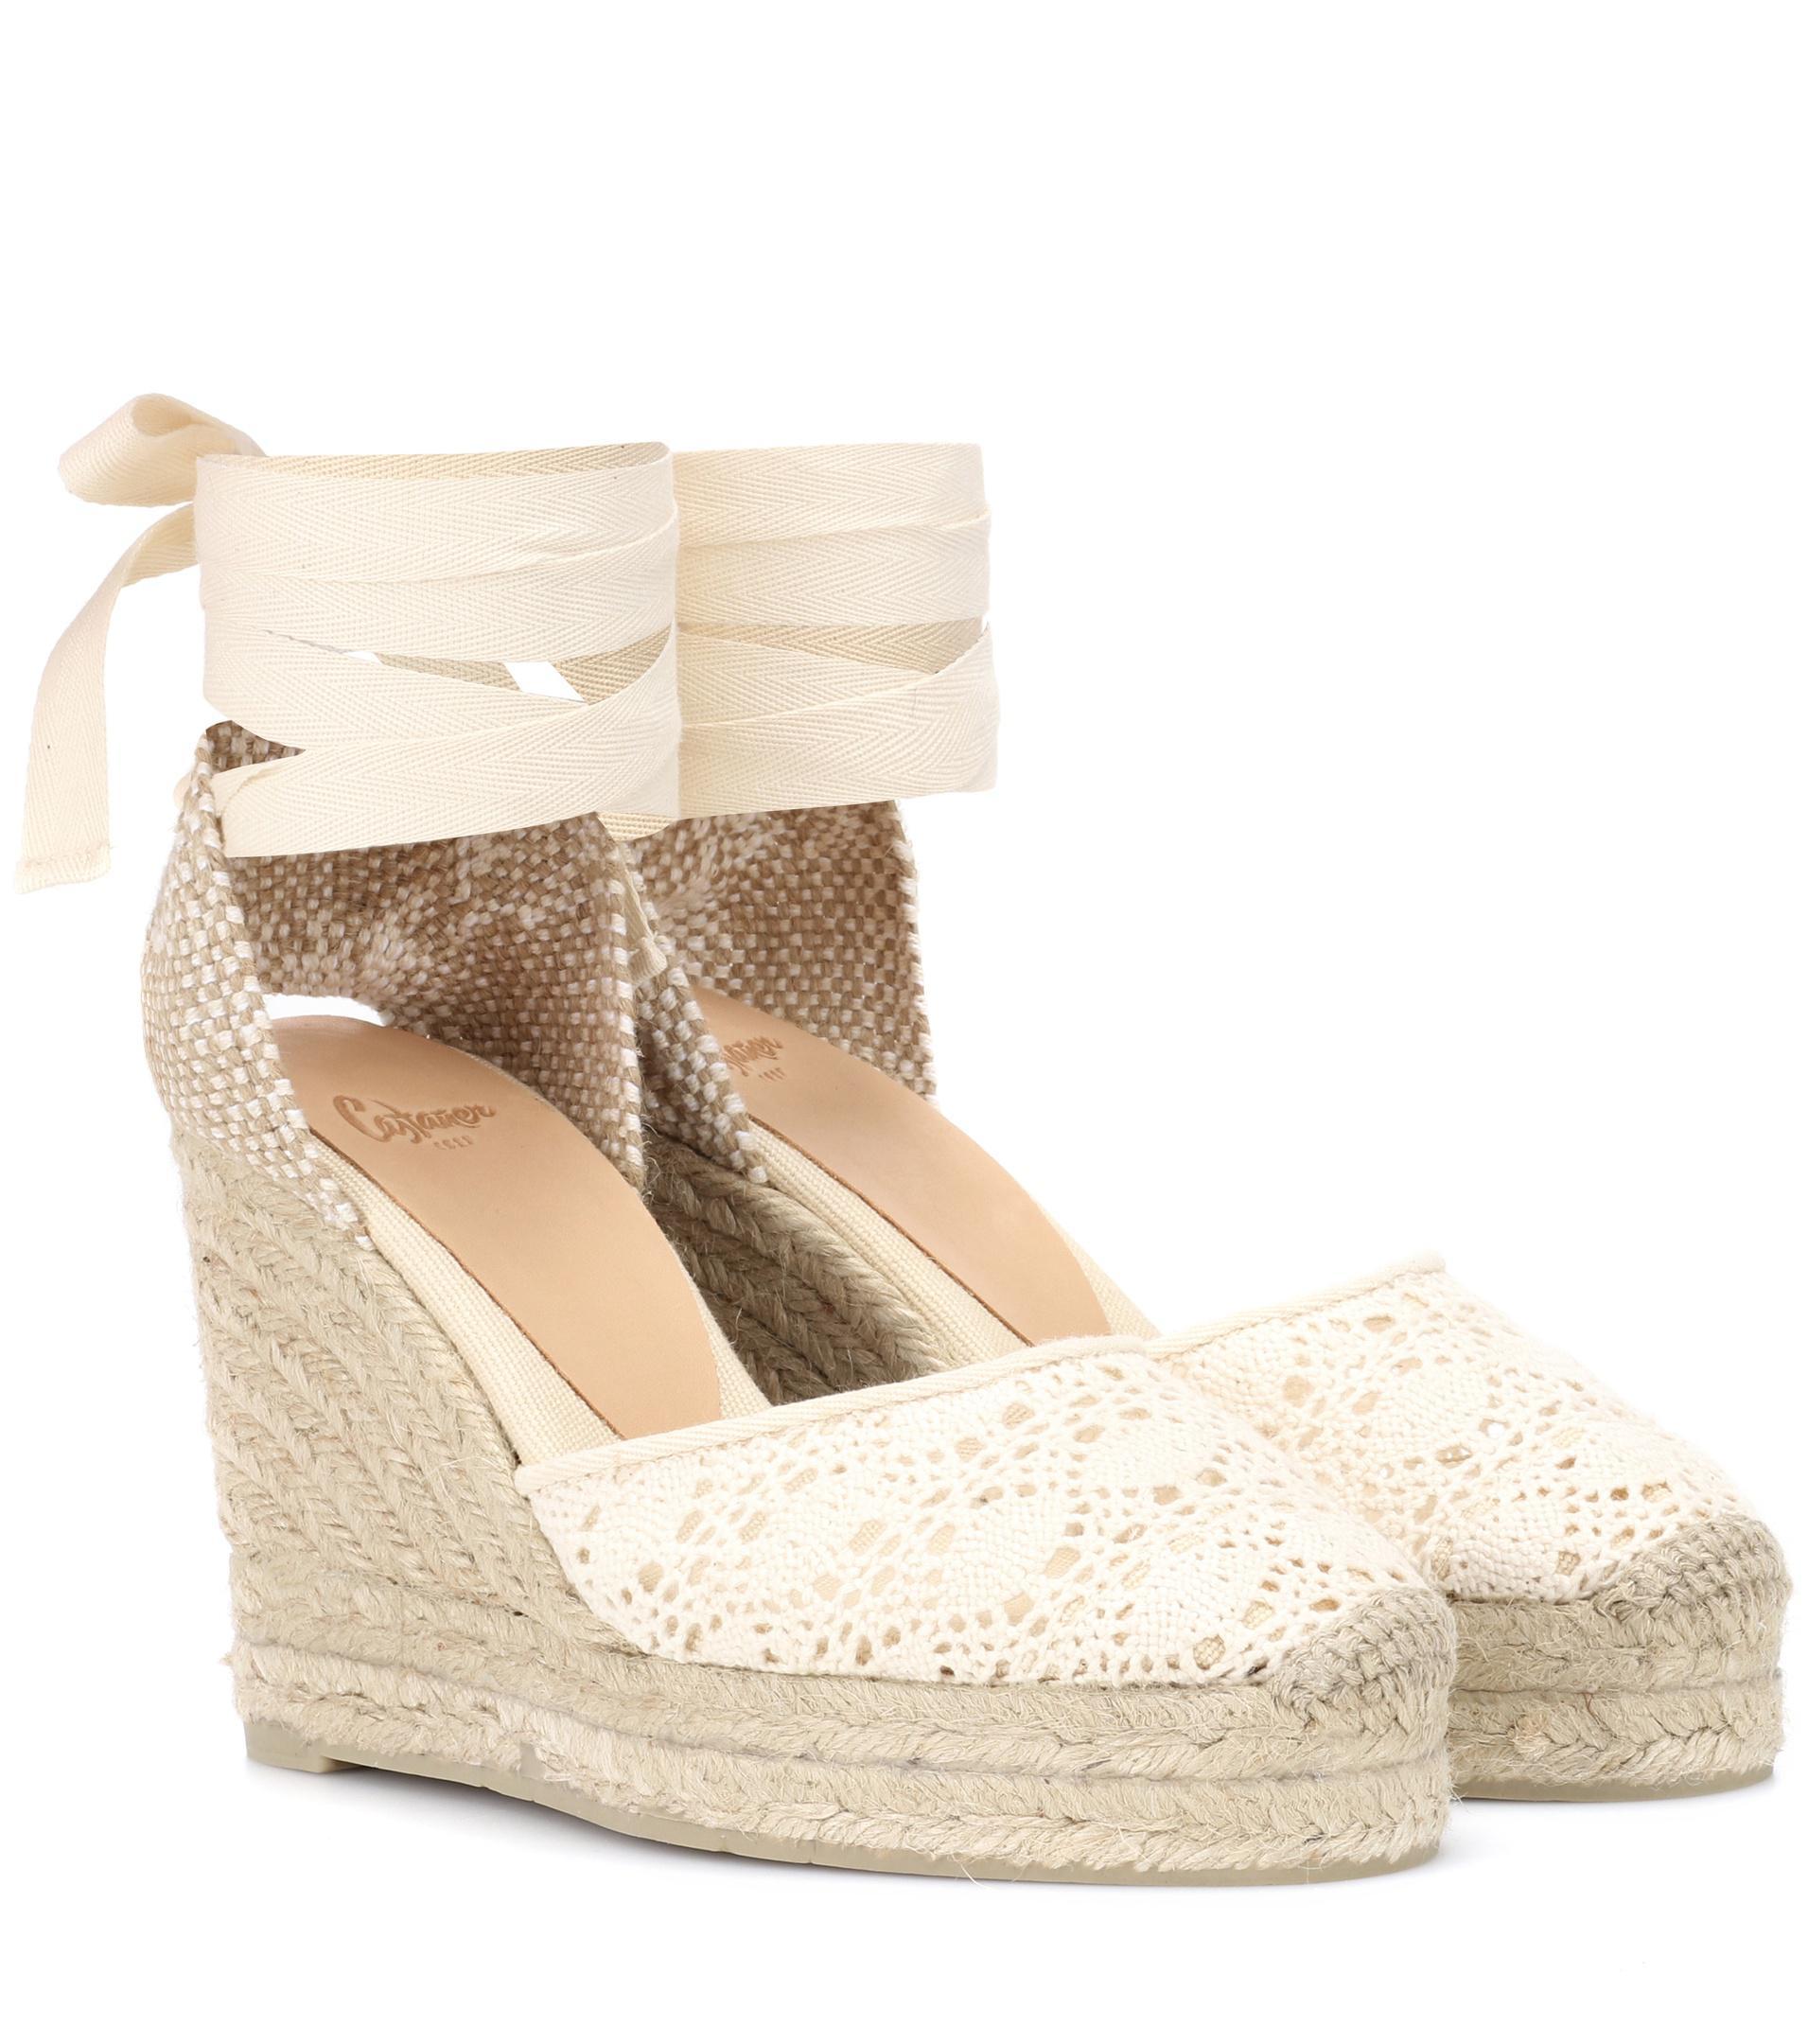 04f5bb46e3f Castaner White Carina Crochet Wedge Espadrilles